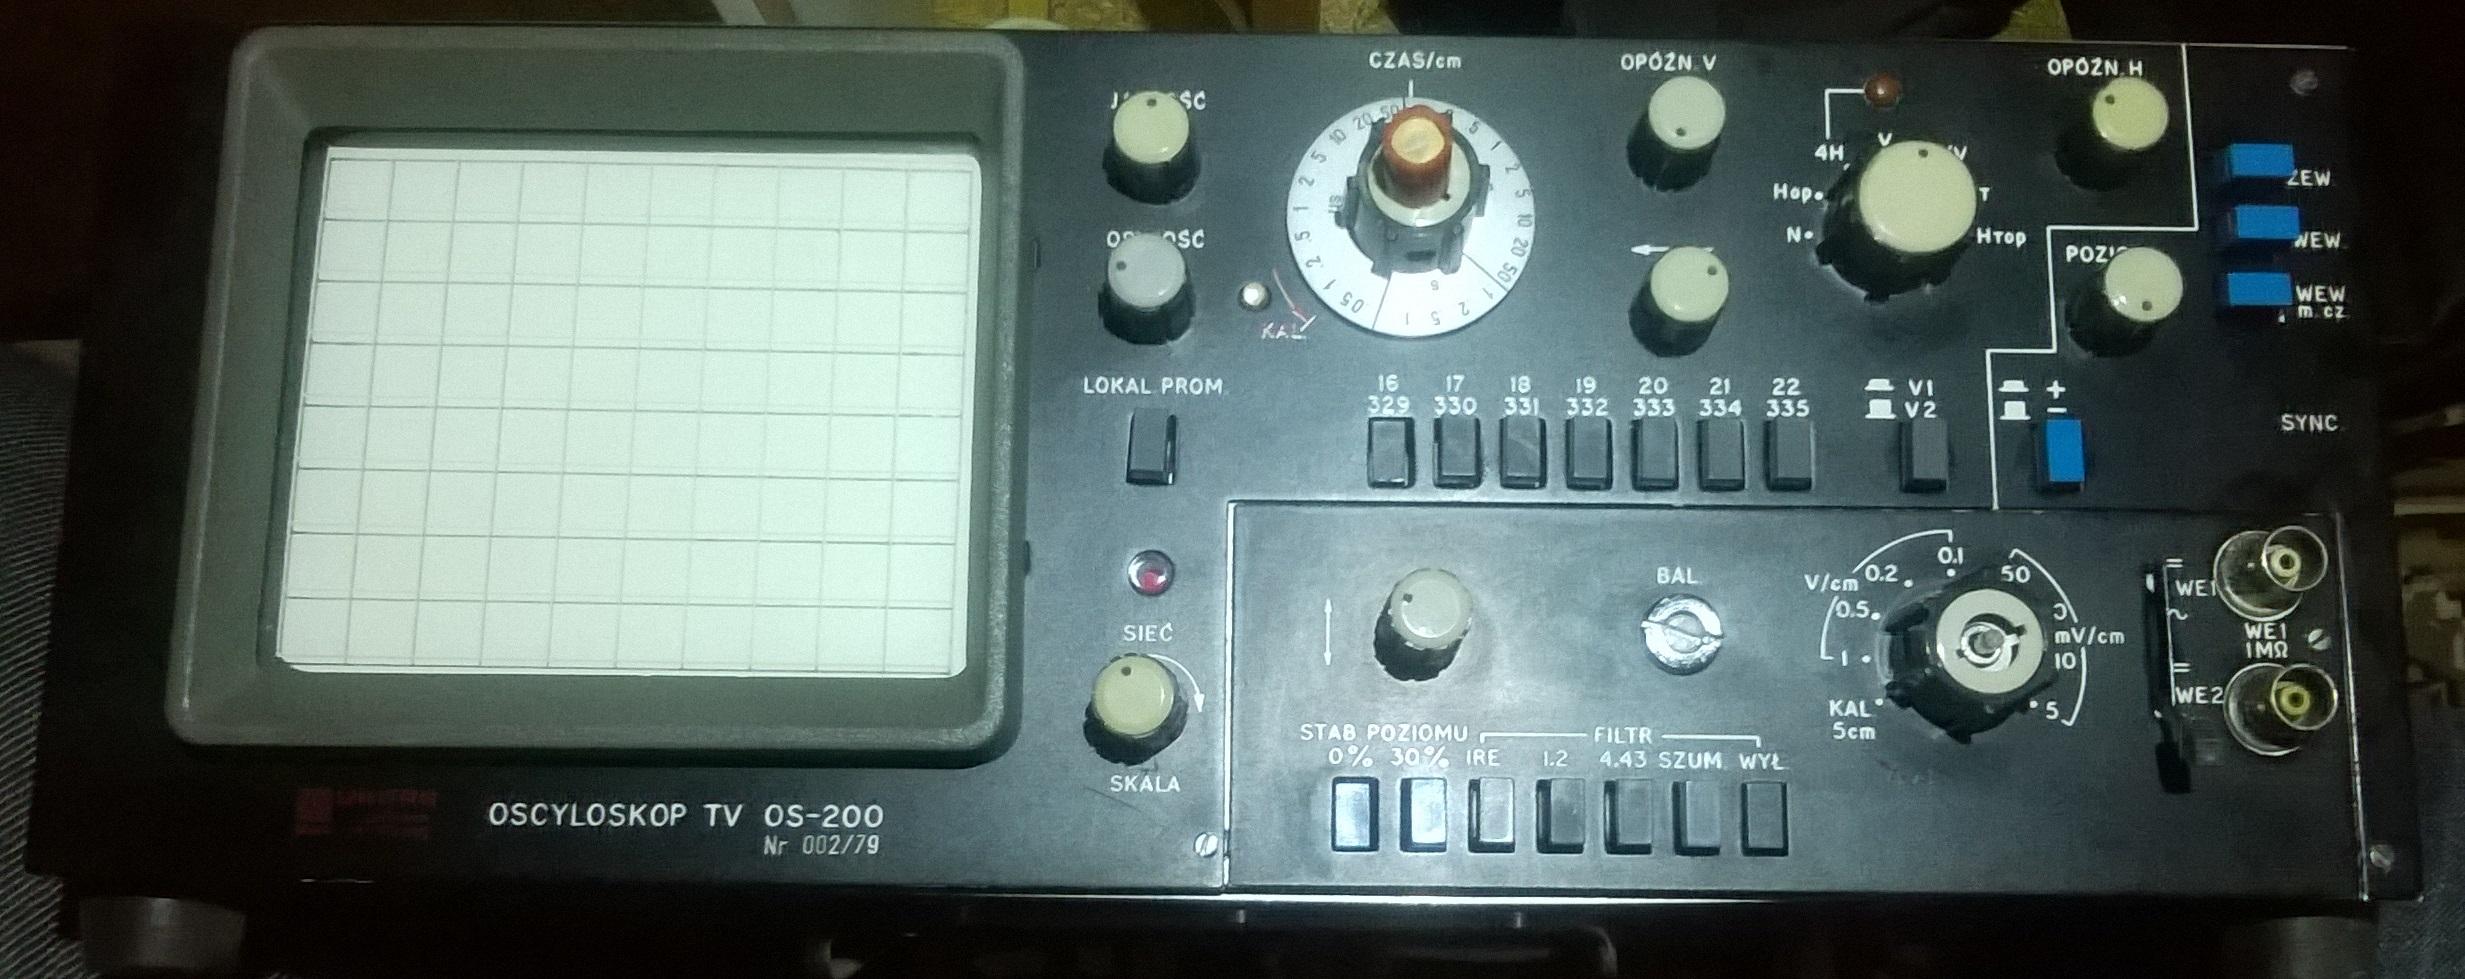 Szukam instrukcji obs�ugi do oscyloskopu Unitra TV OS-200